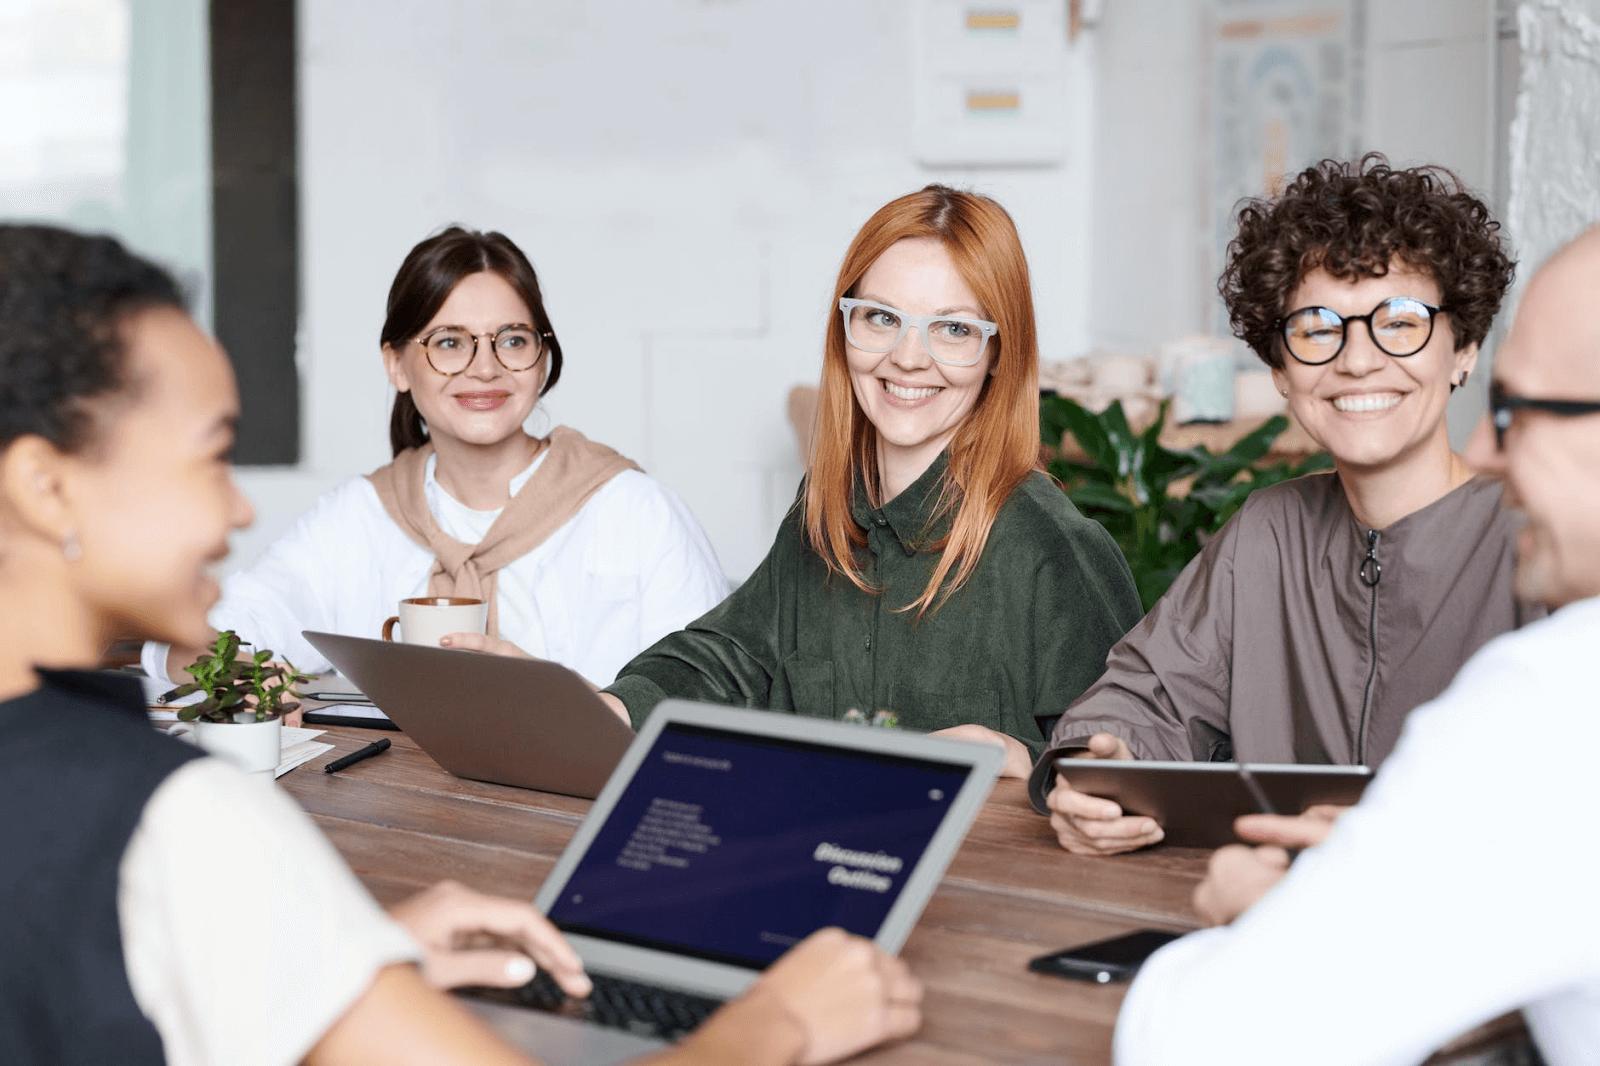 Codvo employees planning cybersecurity awareness training